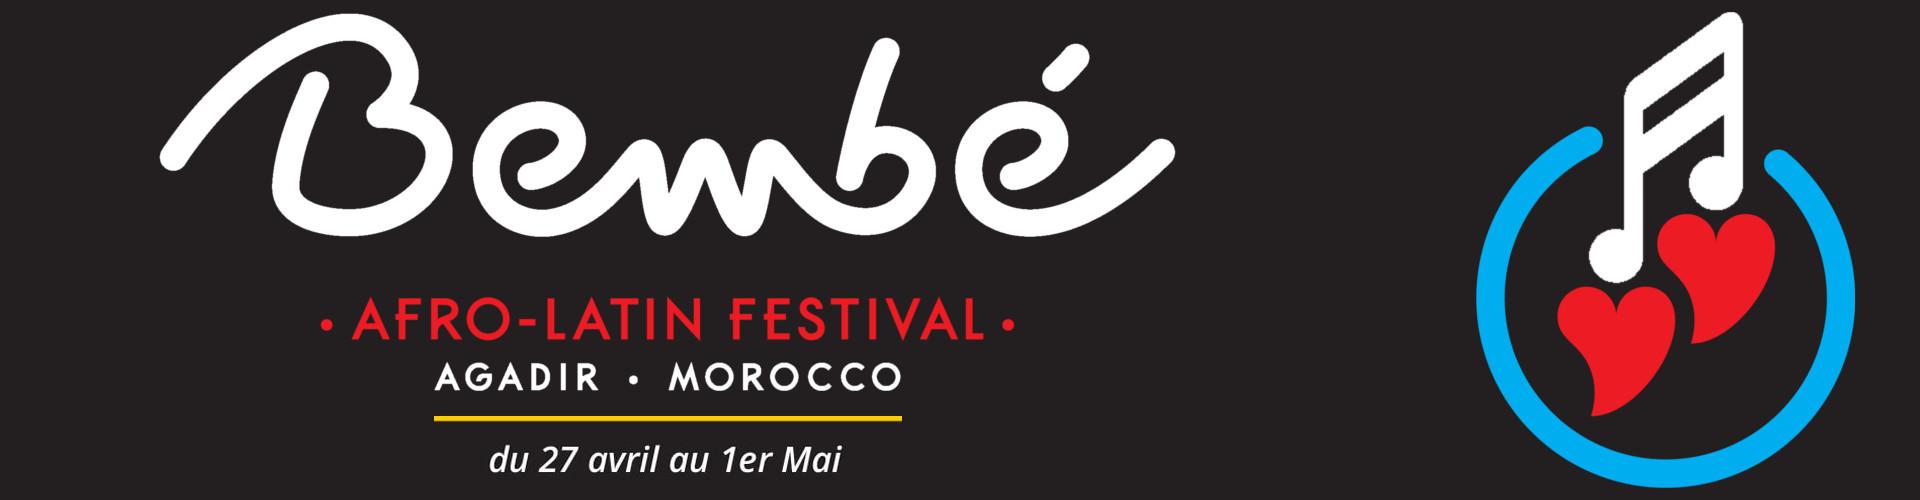 Agadir au rythme du «BEMBE afro-latin»